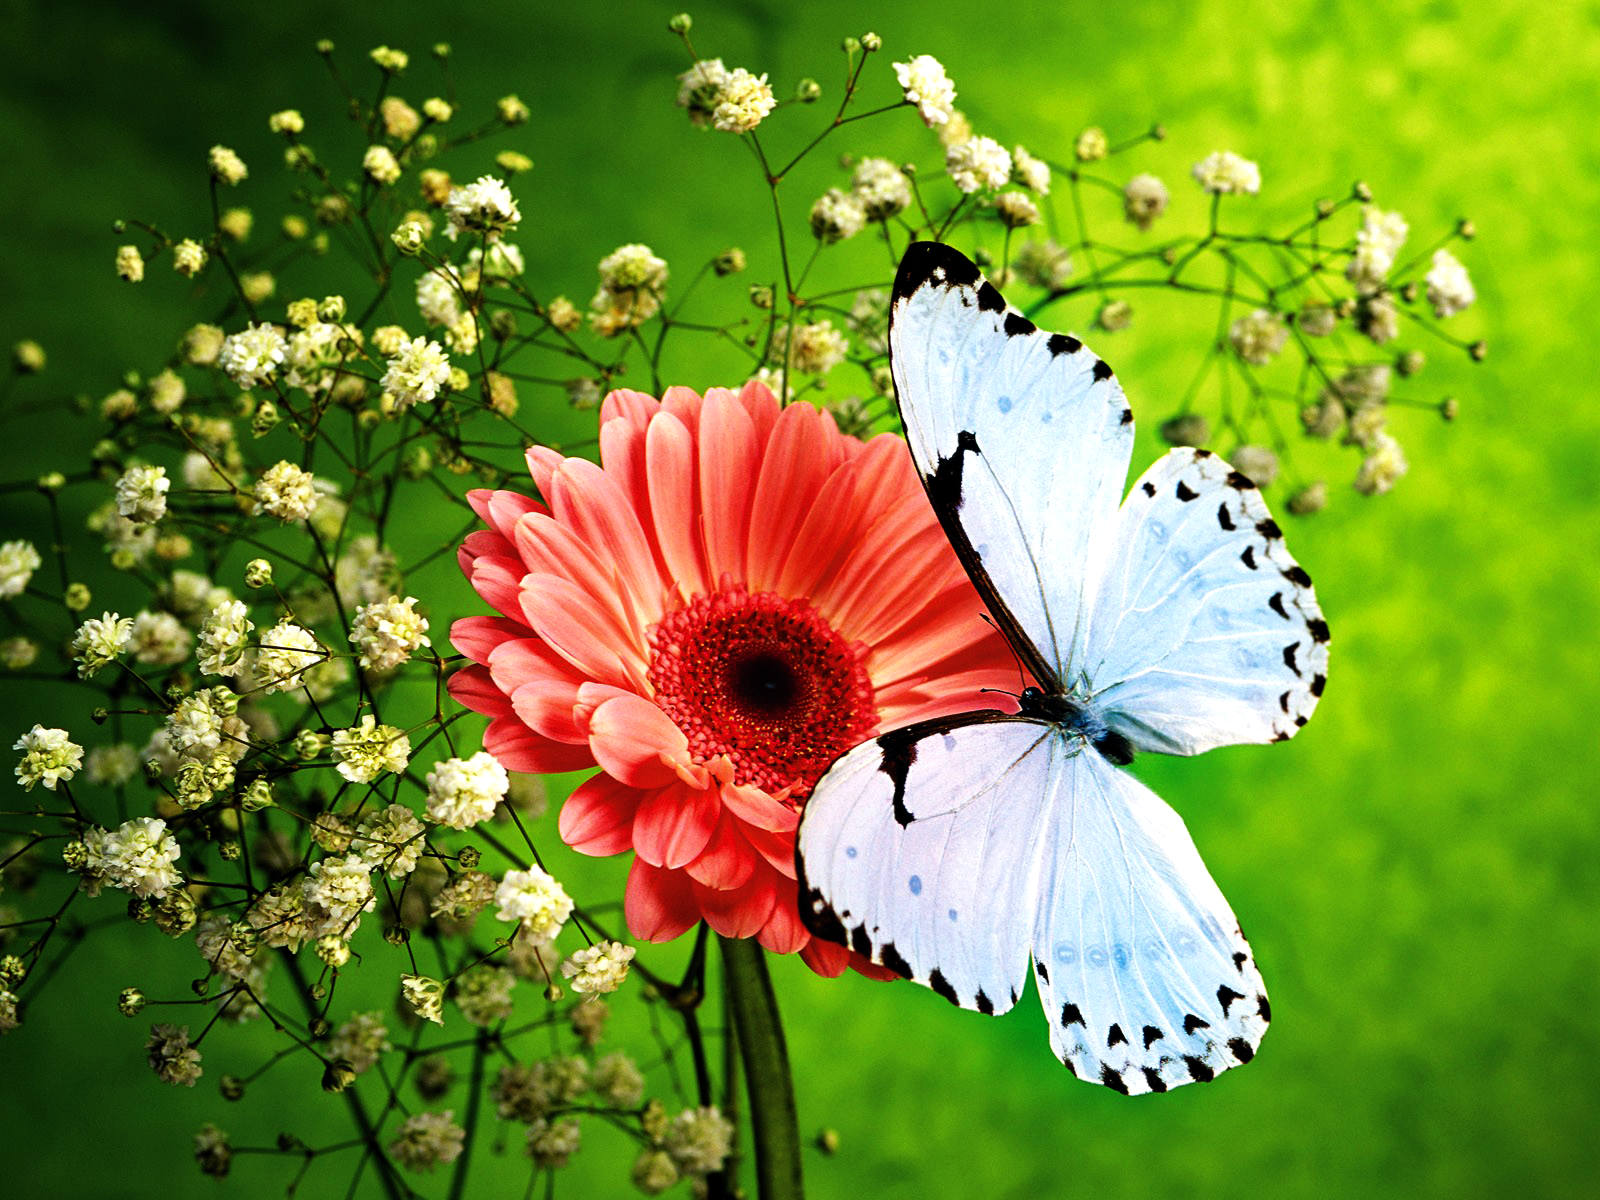 ImagesList.com: Wallpapers With Butterflies 6